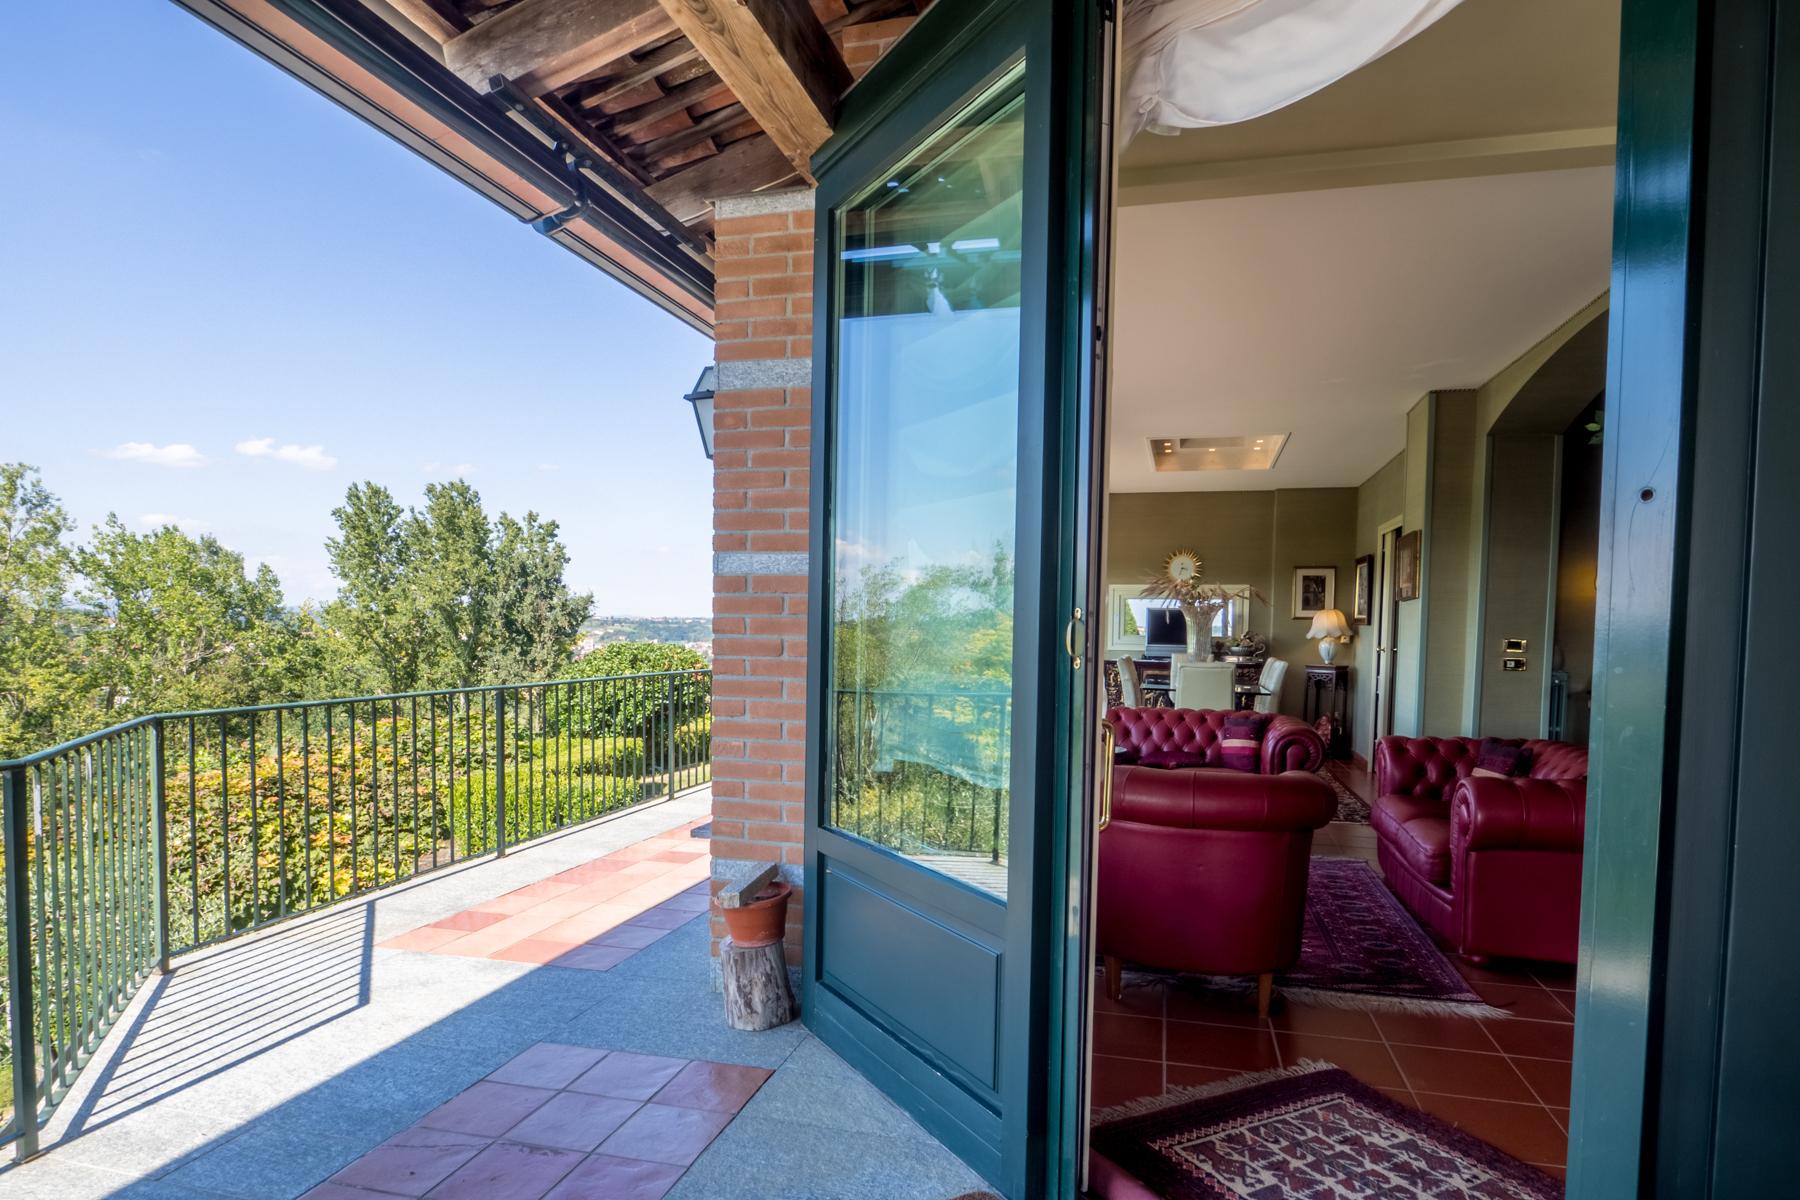 Villa in Vendita a Cantarana: 5 locali, 700 mq - Foto 10